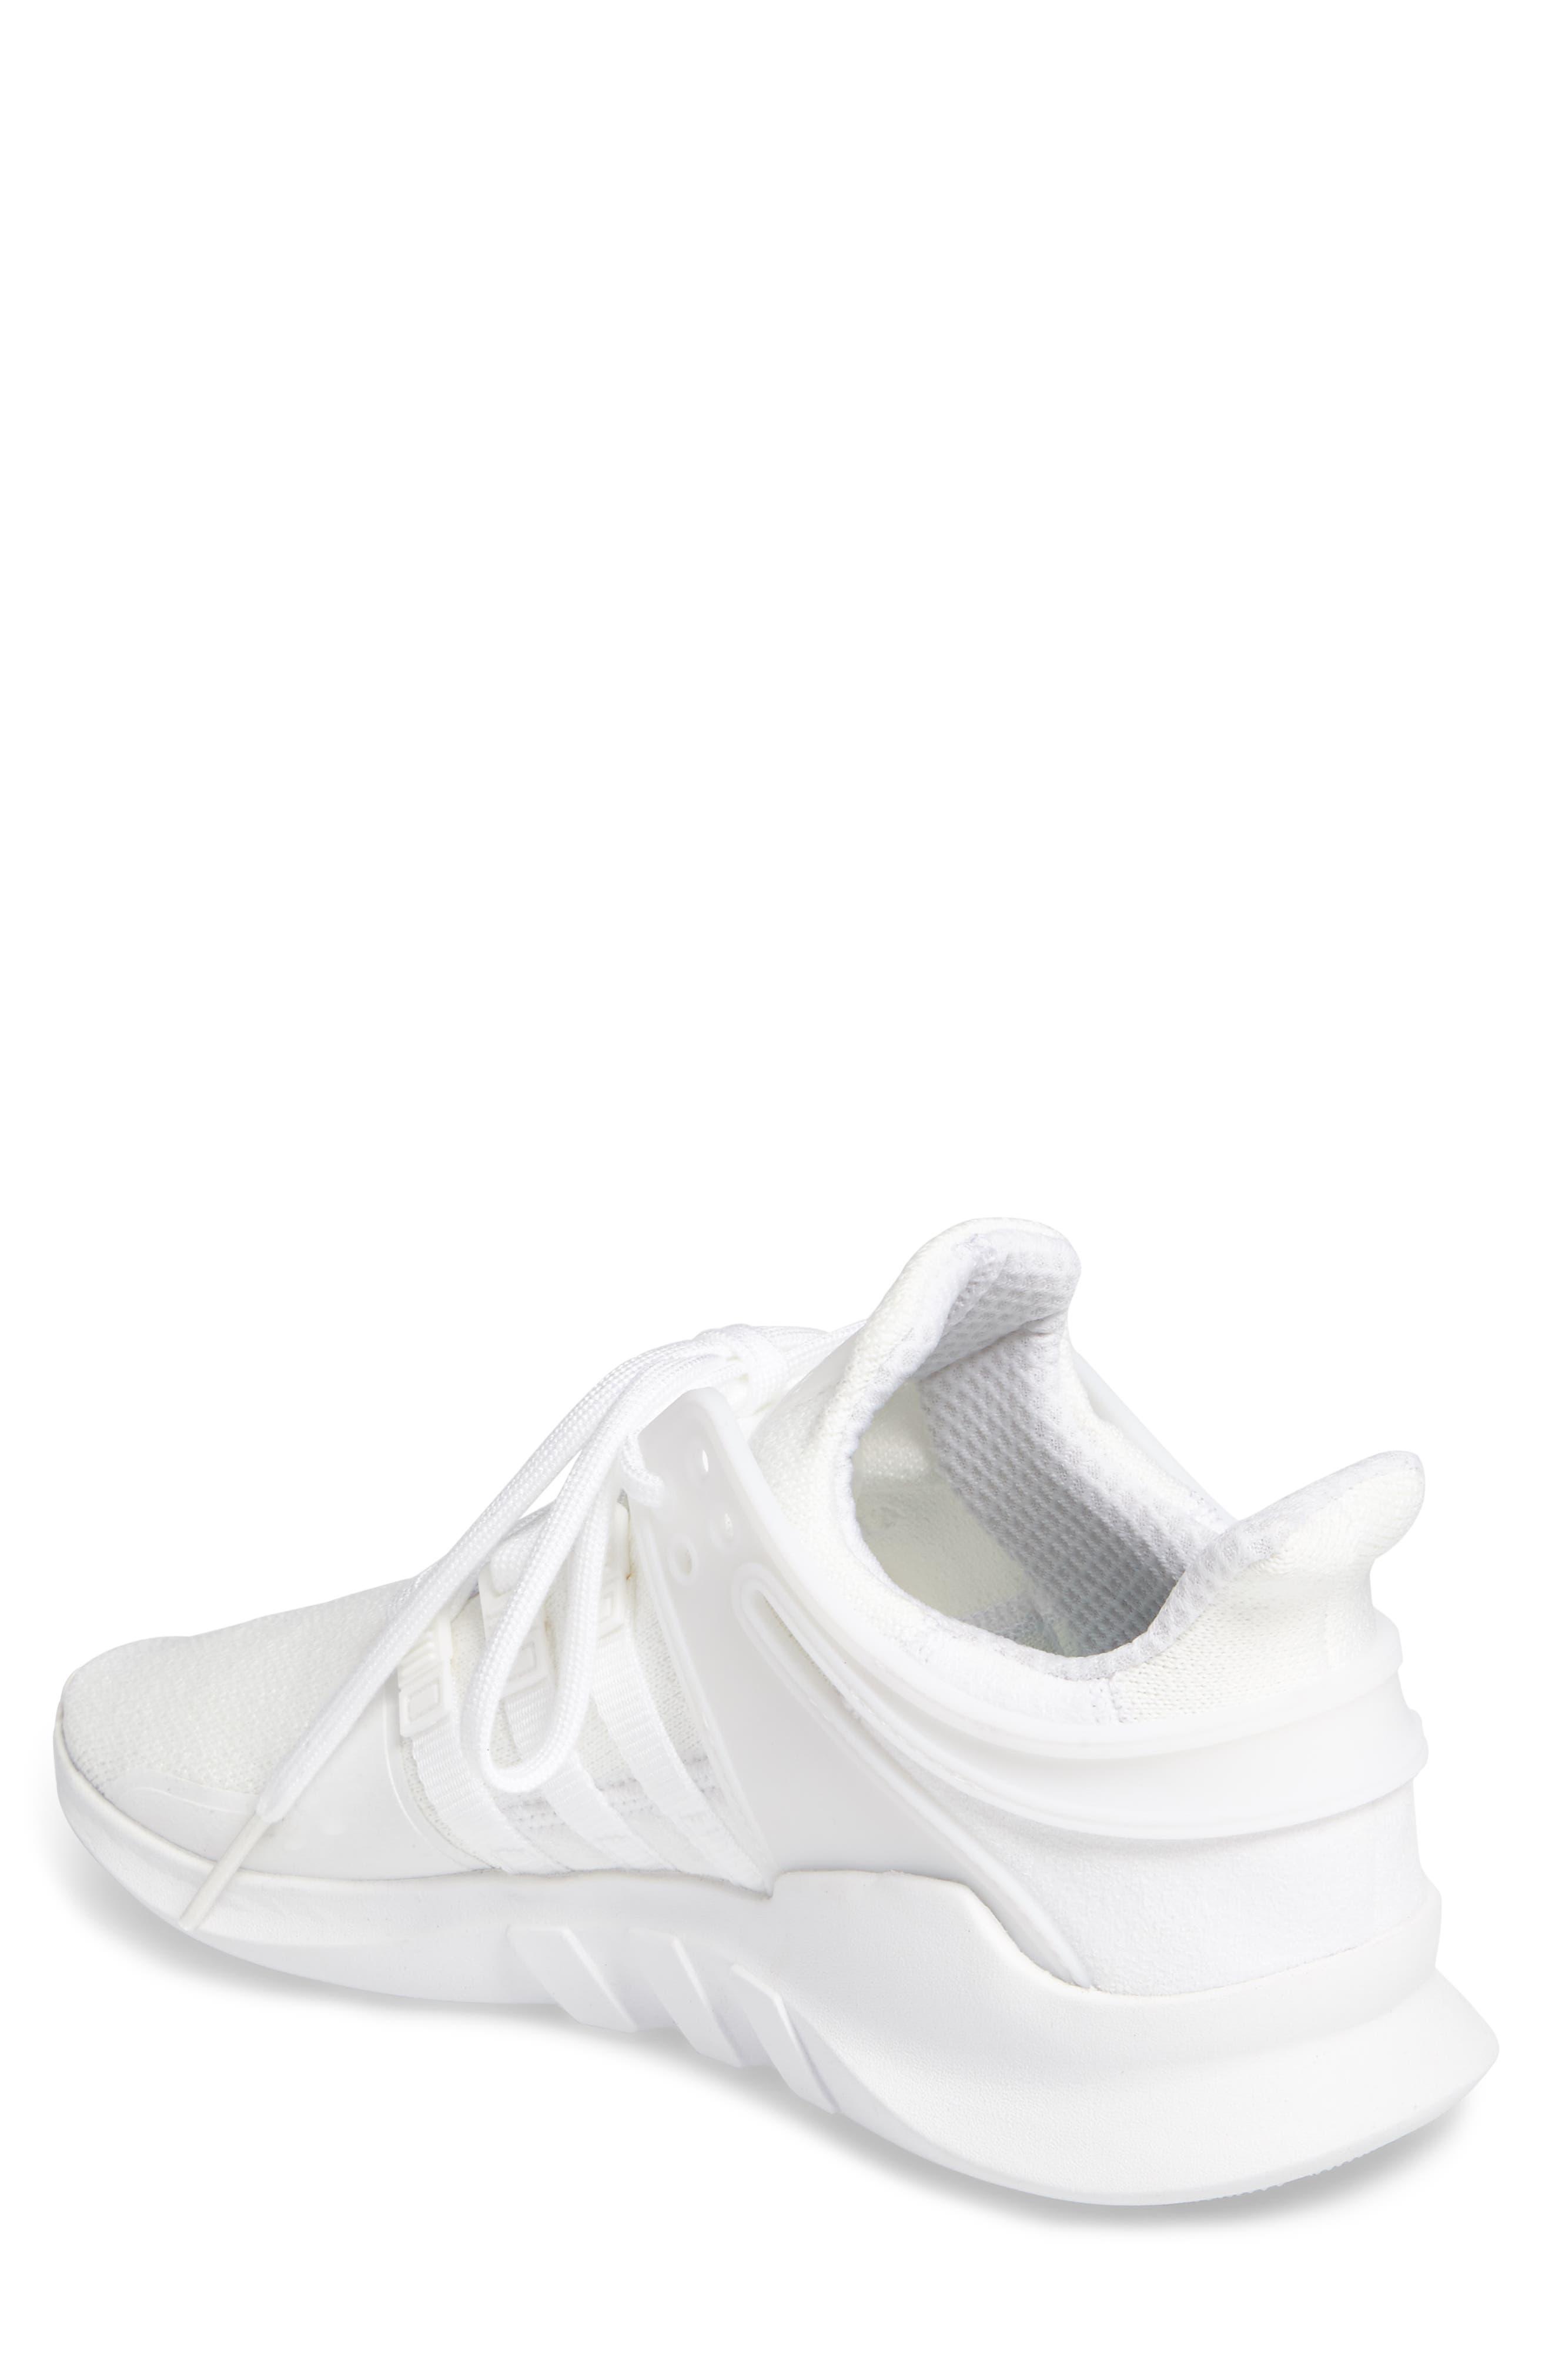 EQT Support Adv Sneaker,                             Alternate thumbnail 2, color,                             White/Core Black